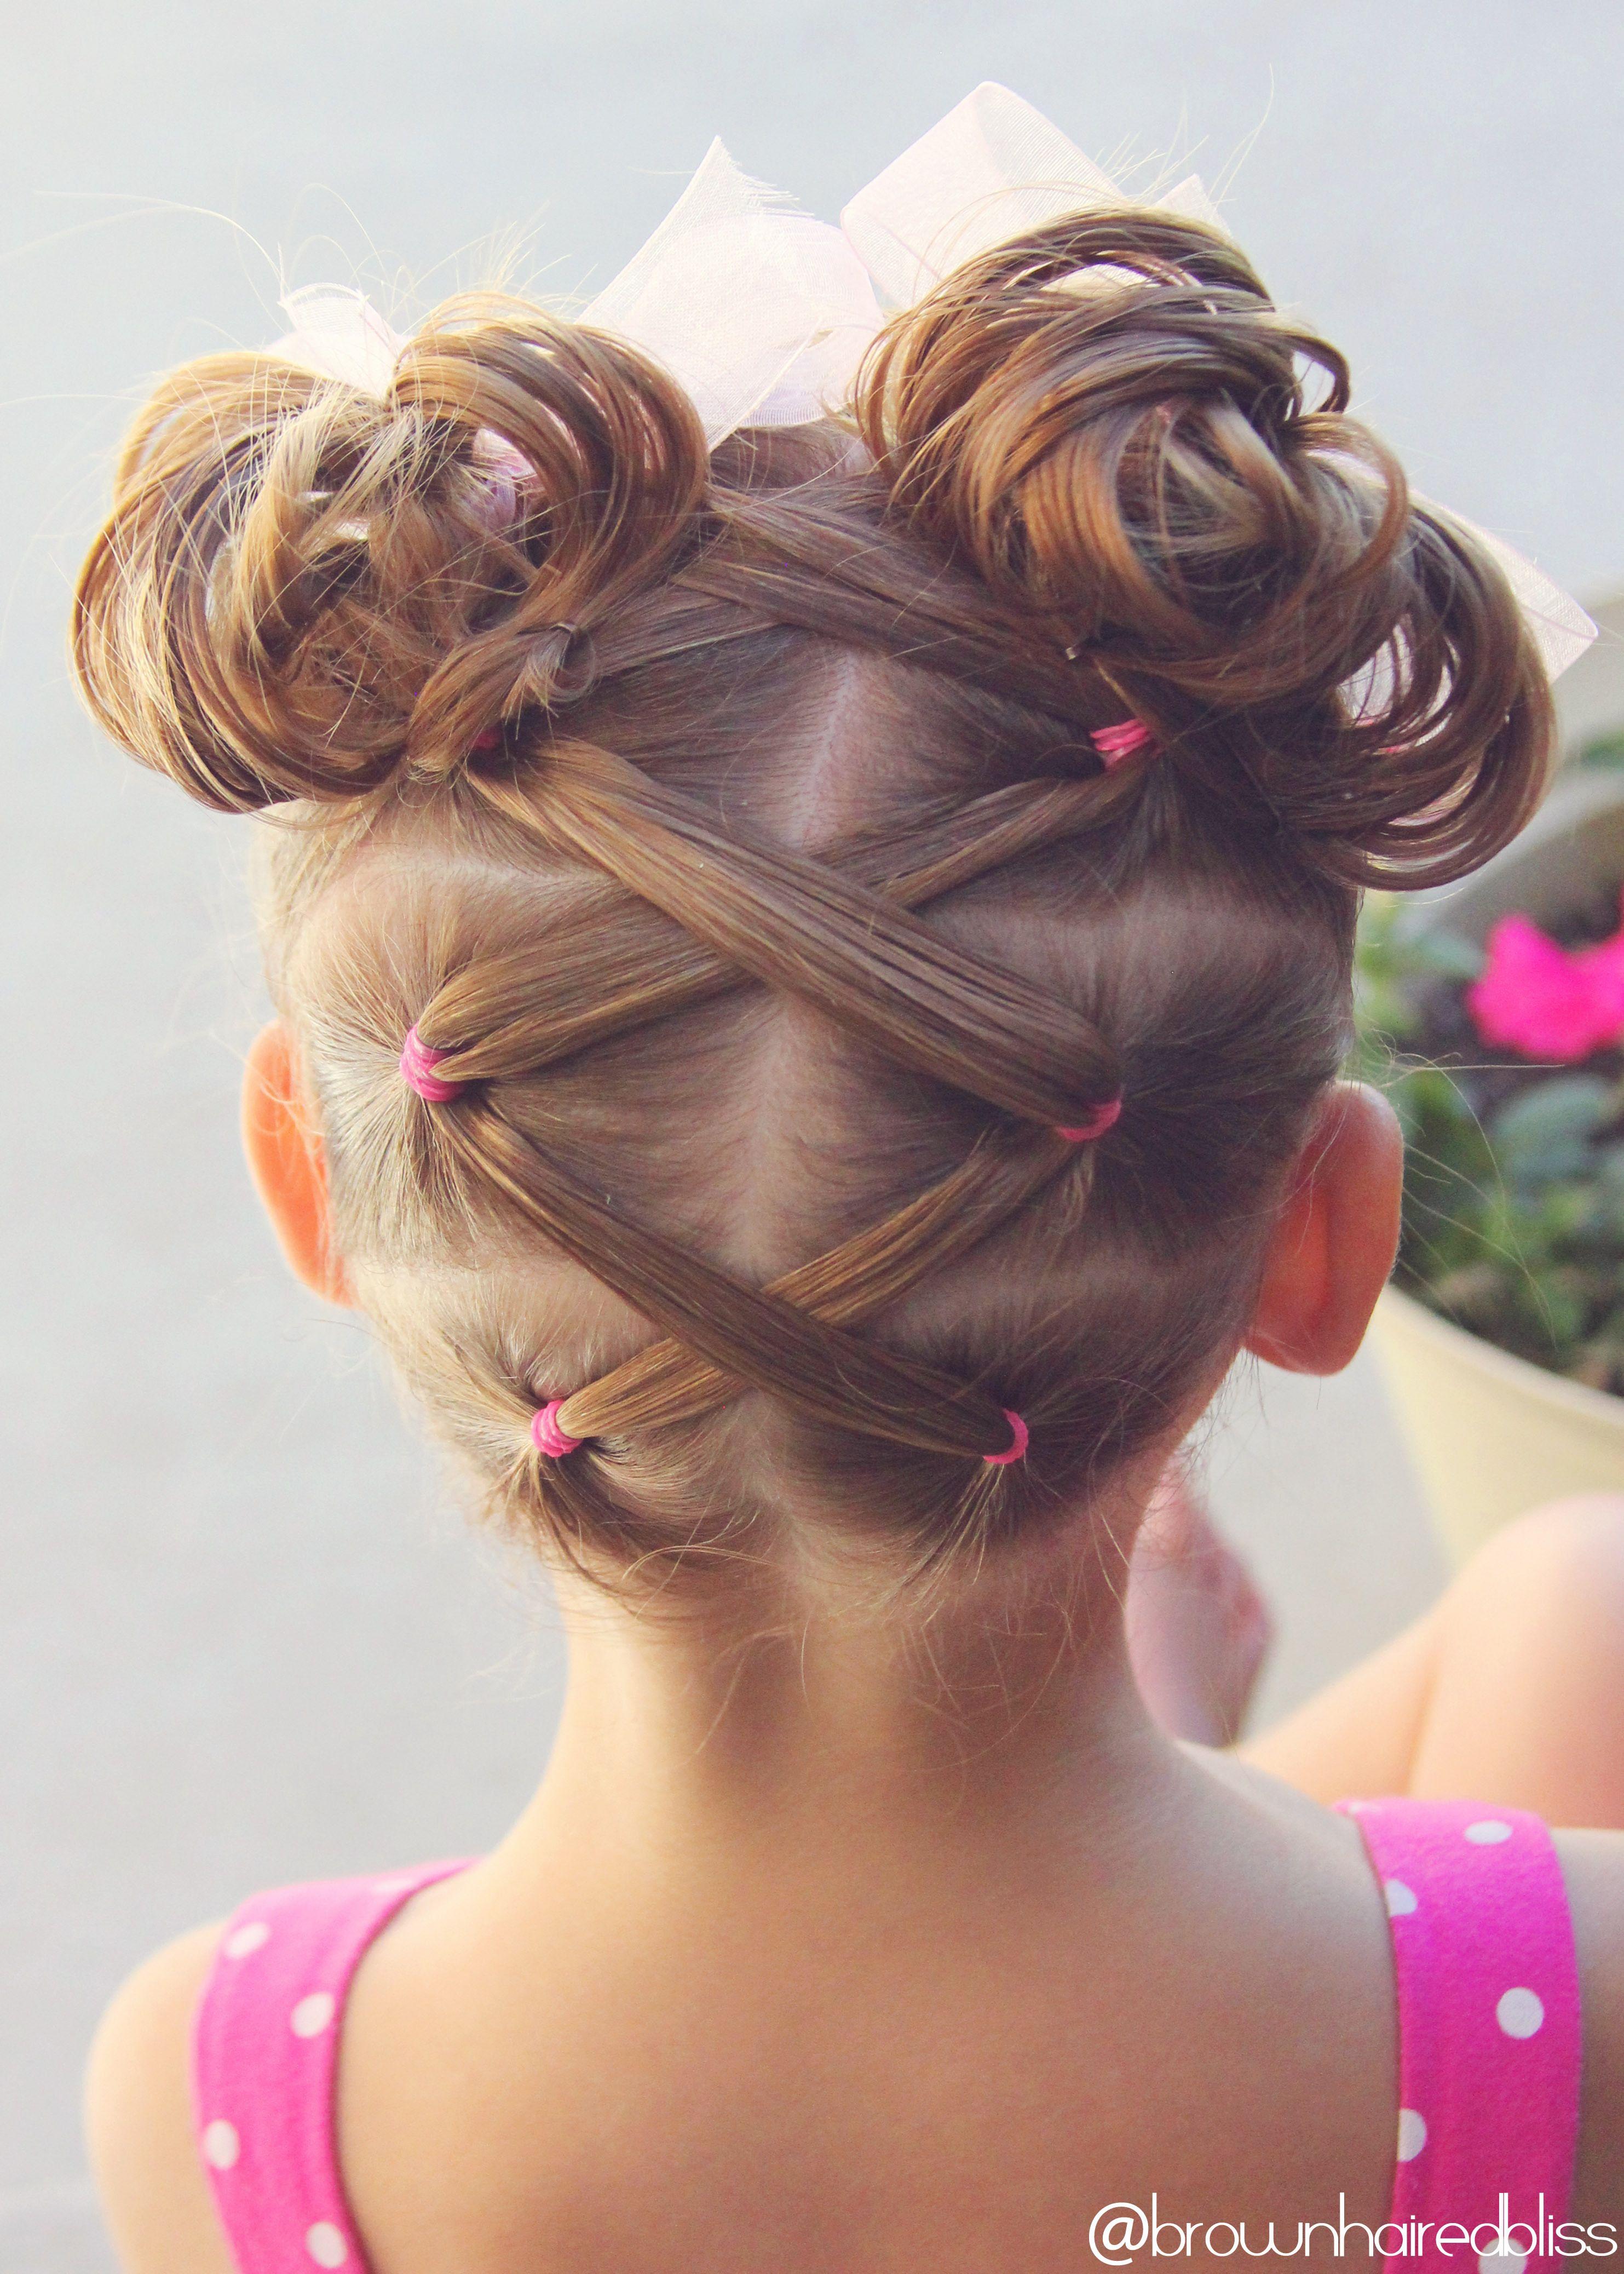 Crazy hair hair pinterest girl hairstyles hair and hair styles